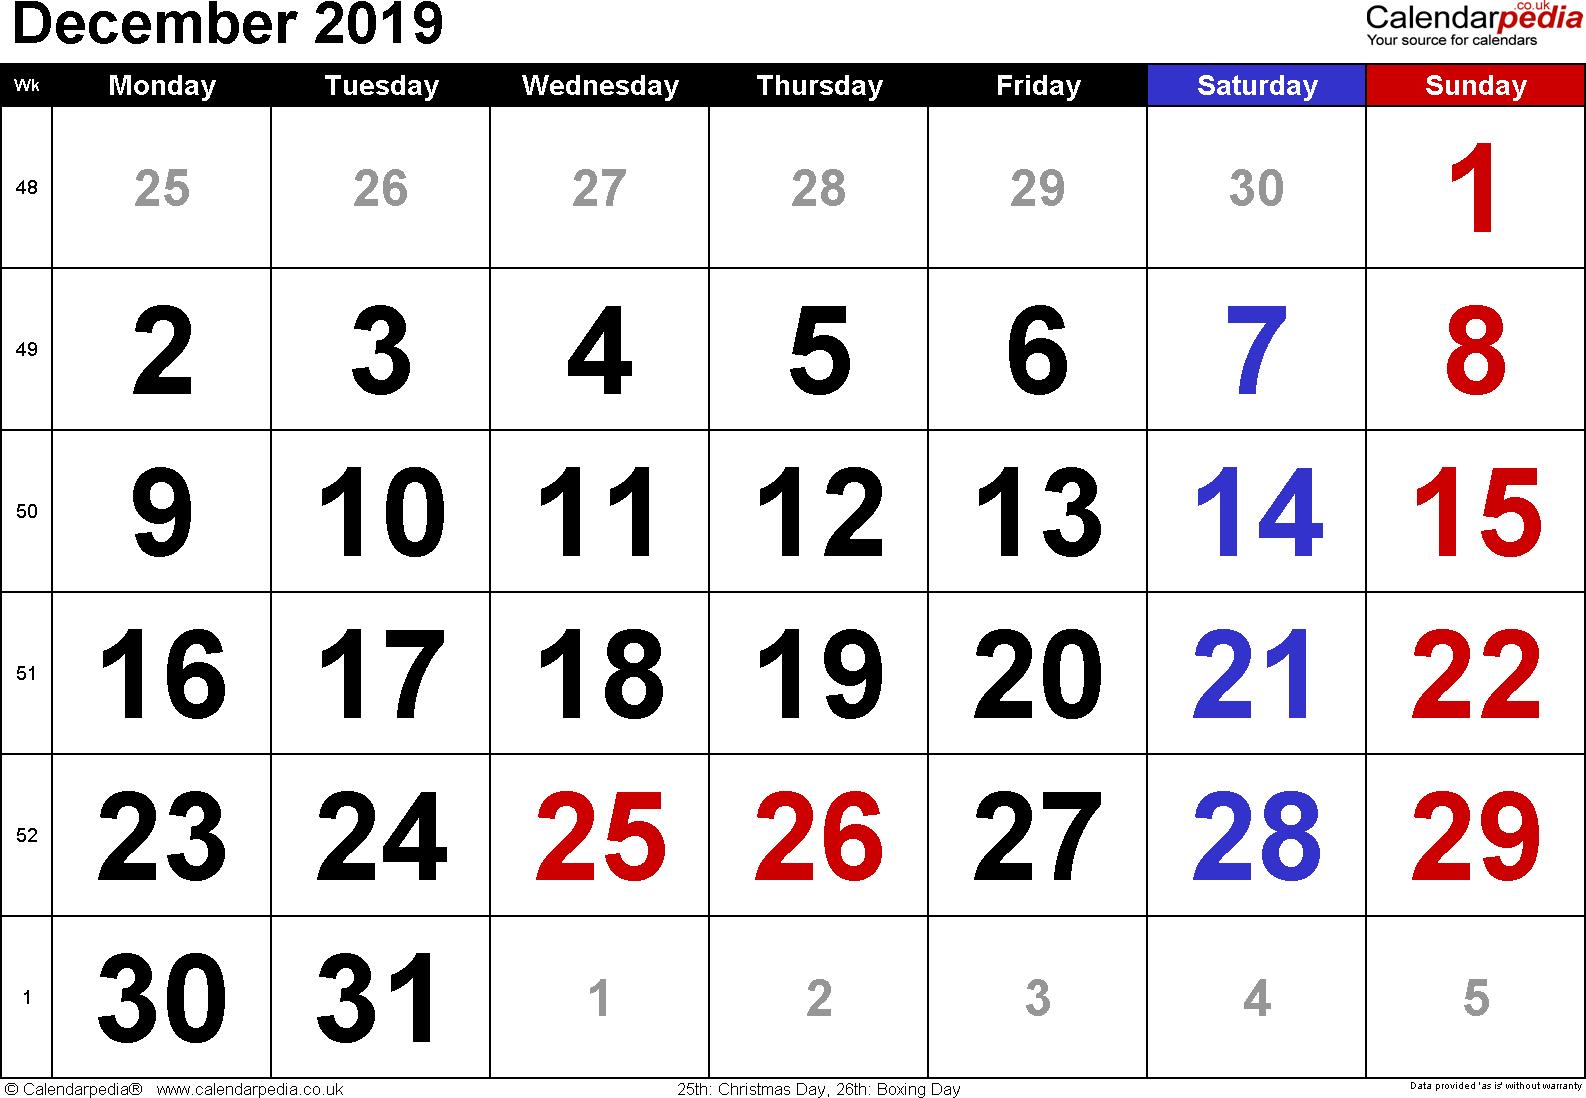 December 2019 Calendar Large Numbers Calendar December 2019 UK, Bank Holidays, Excel/PDF/Word Templates